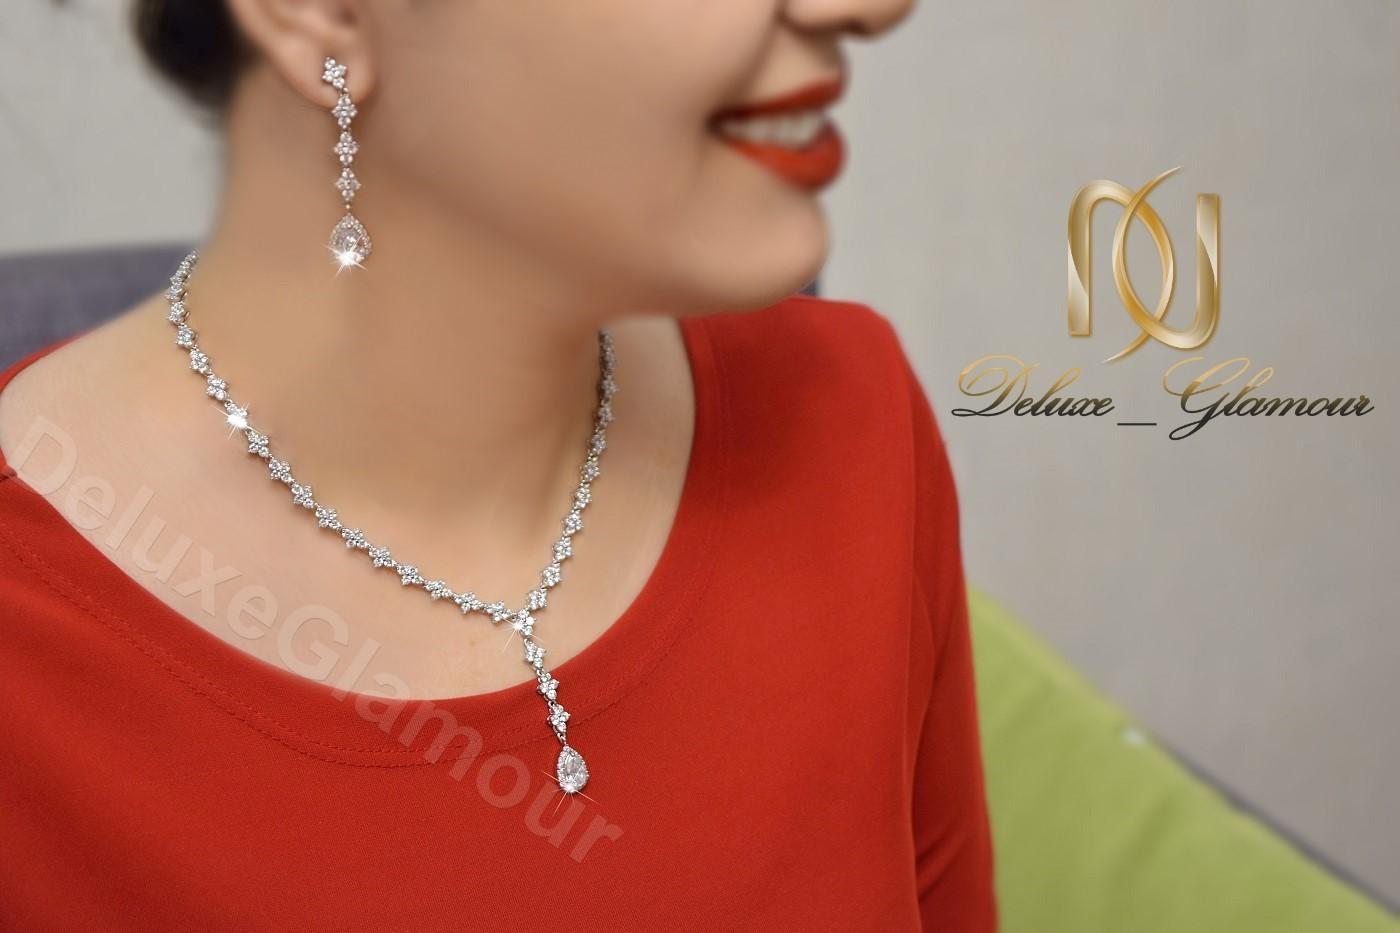 نیم ست جواهري عروس کلیو با کریستالهای سواروسکی Ns-n202(